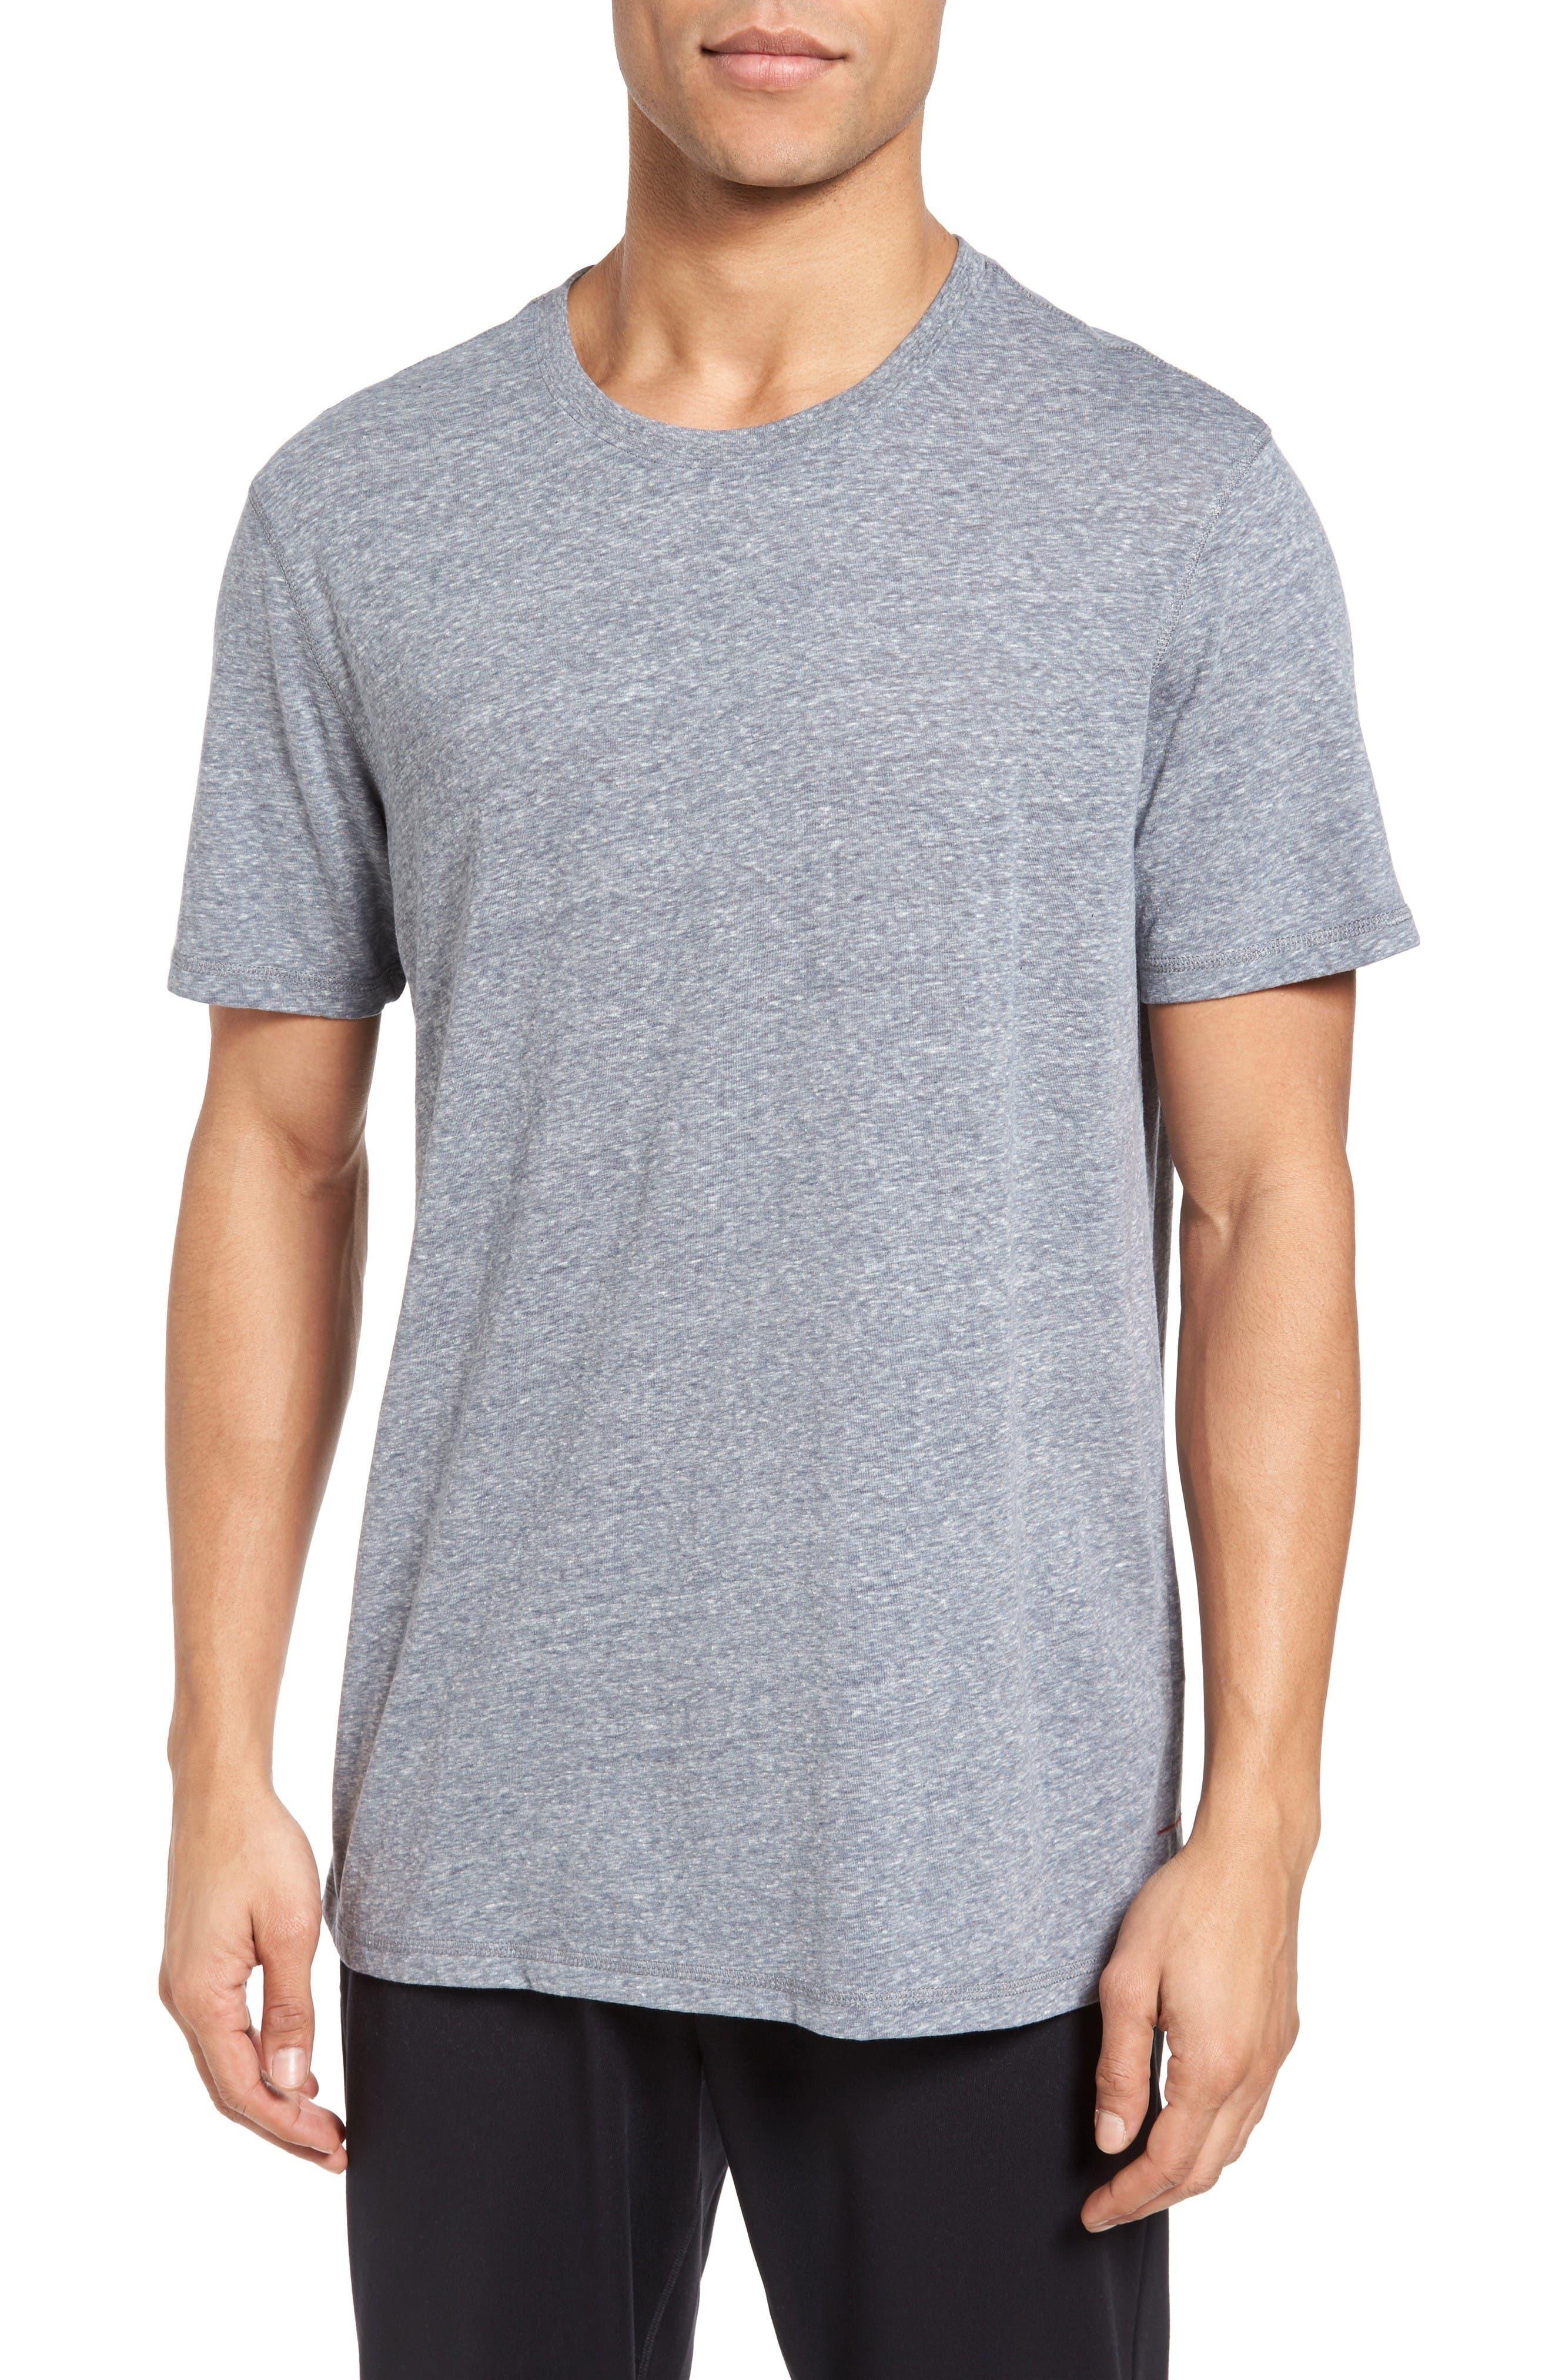 Daniel Buchler Recycled Cotton Blend T-Shirt